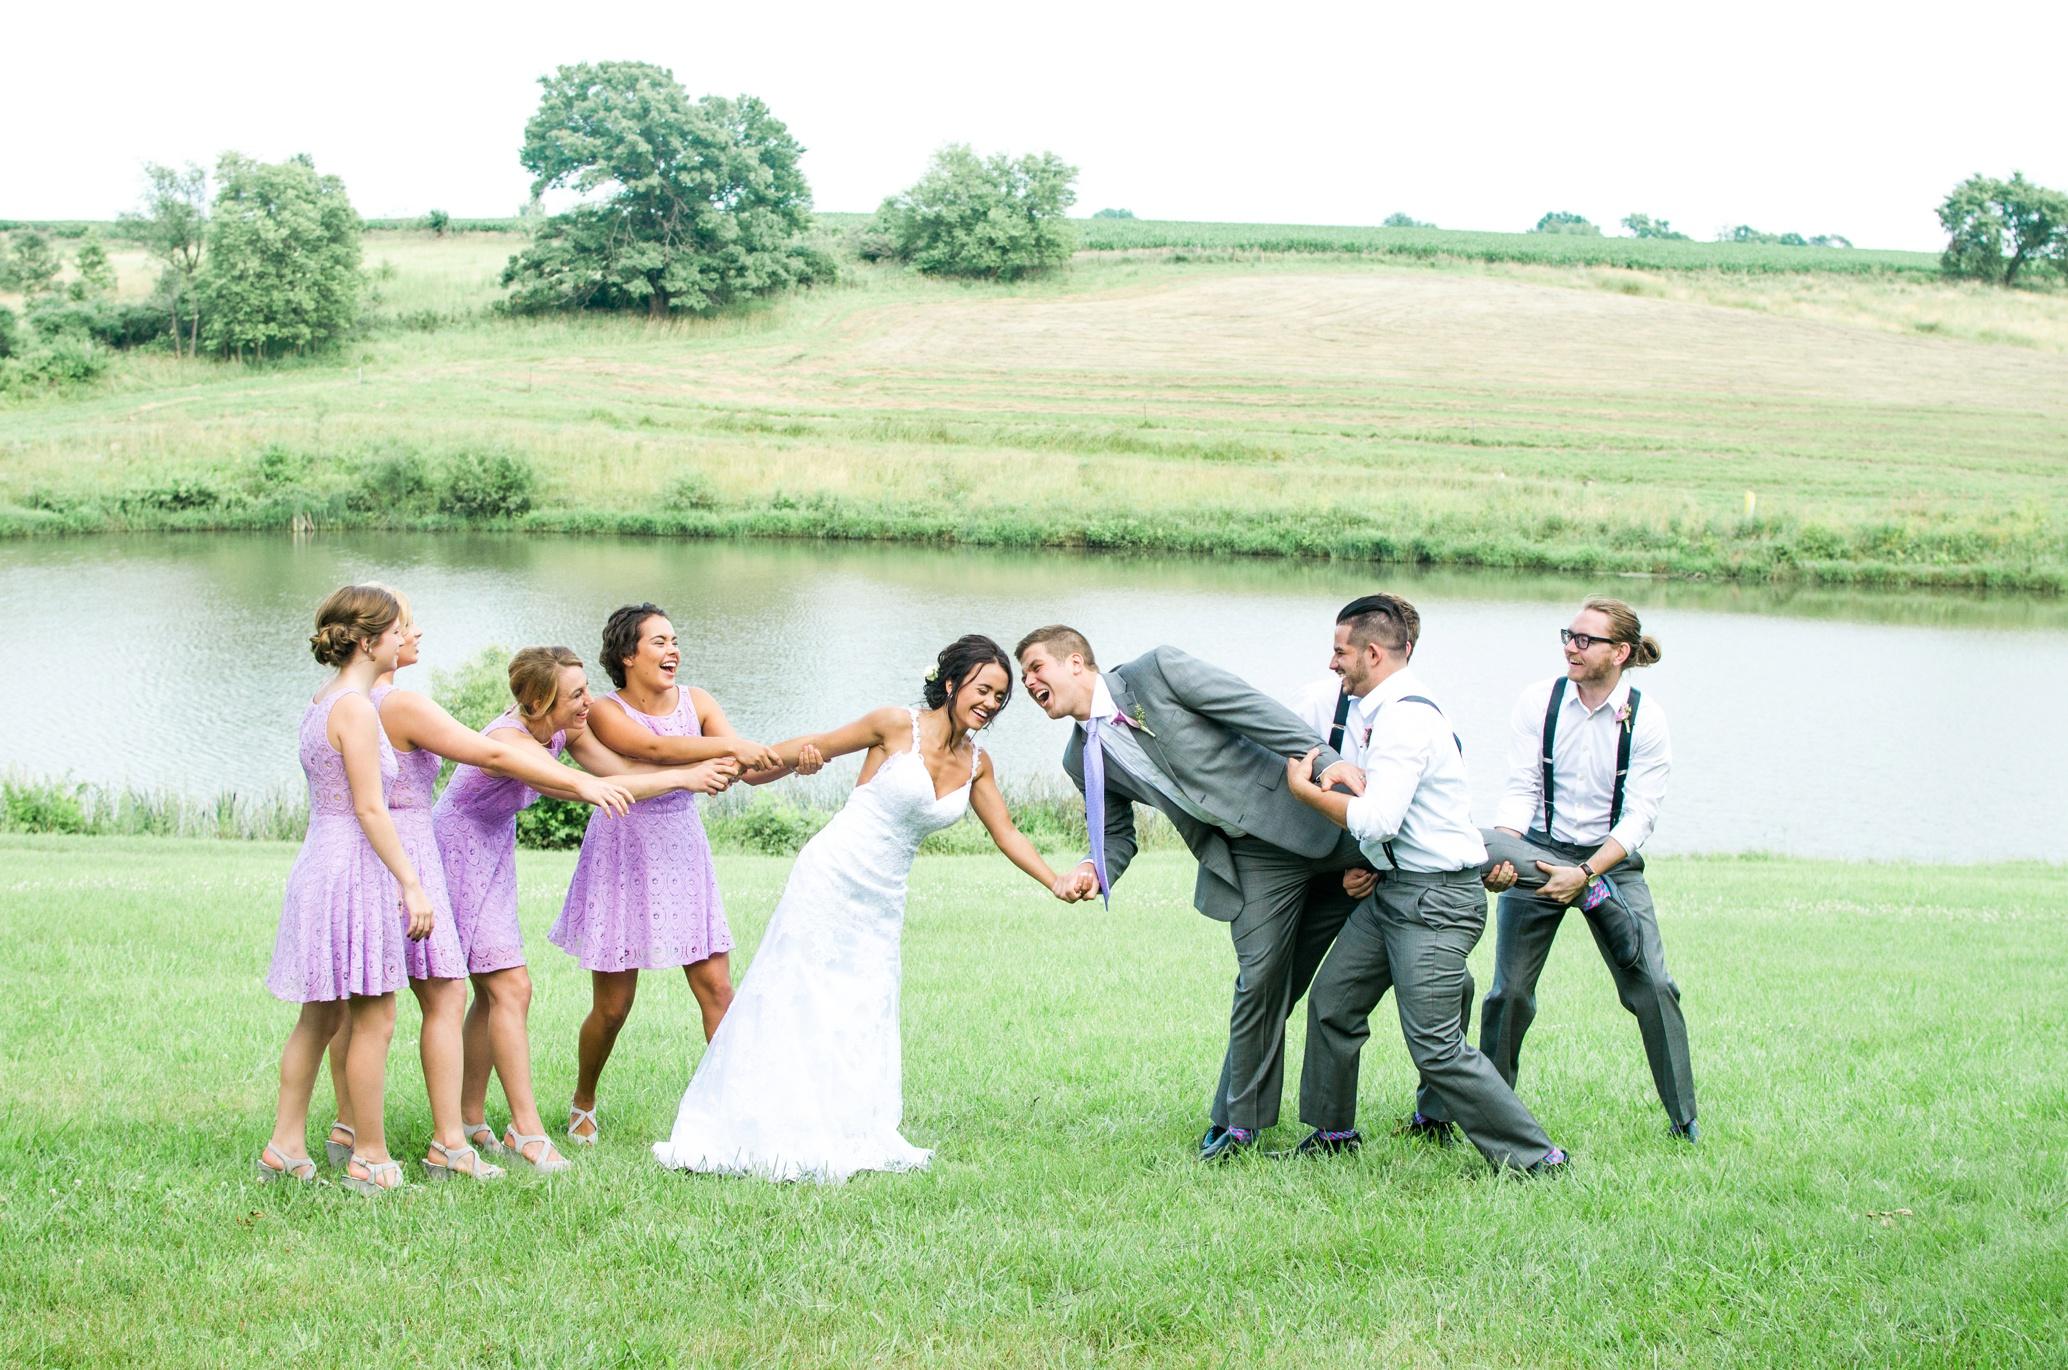 Barnes' Place Rustic Outdoor Wedding | Ali Leigh Photo Minneapolis Wedding Photographer_0202.jpg